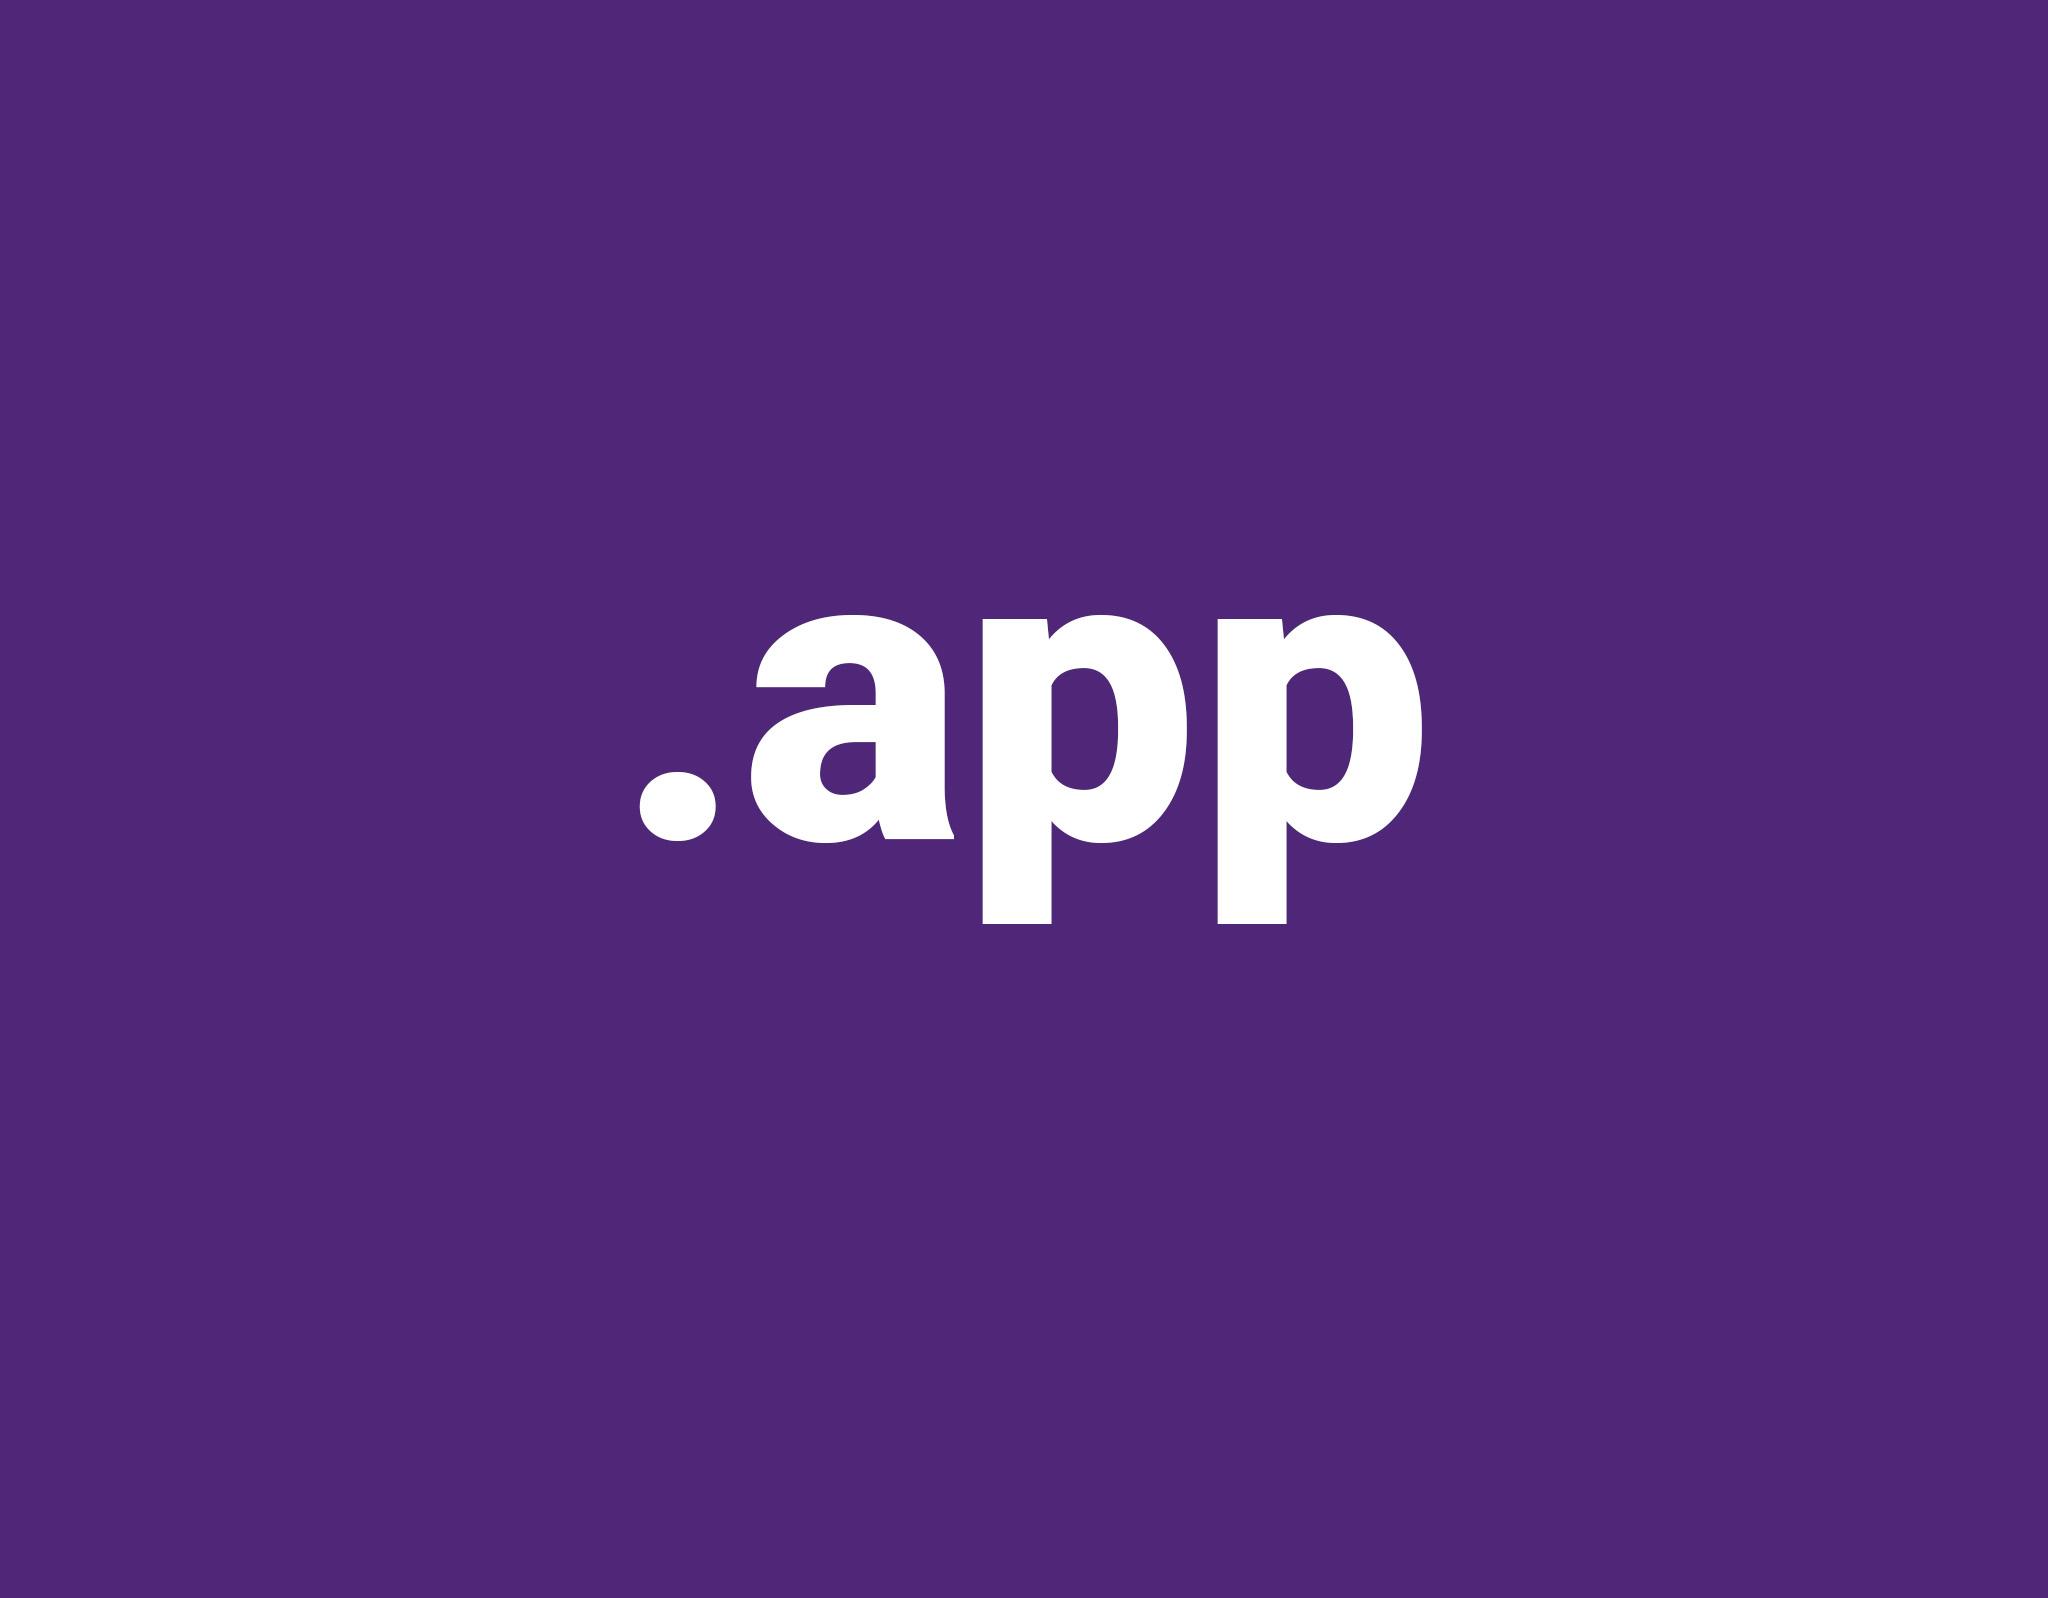 Digital-канал Яндекс-Дзен «Kompot Journal». Каталог каналов Яндекс-Дзен